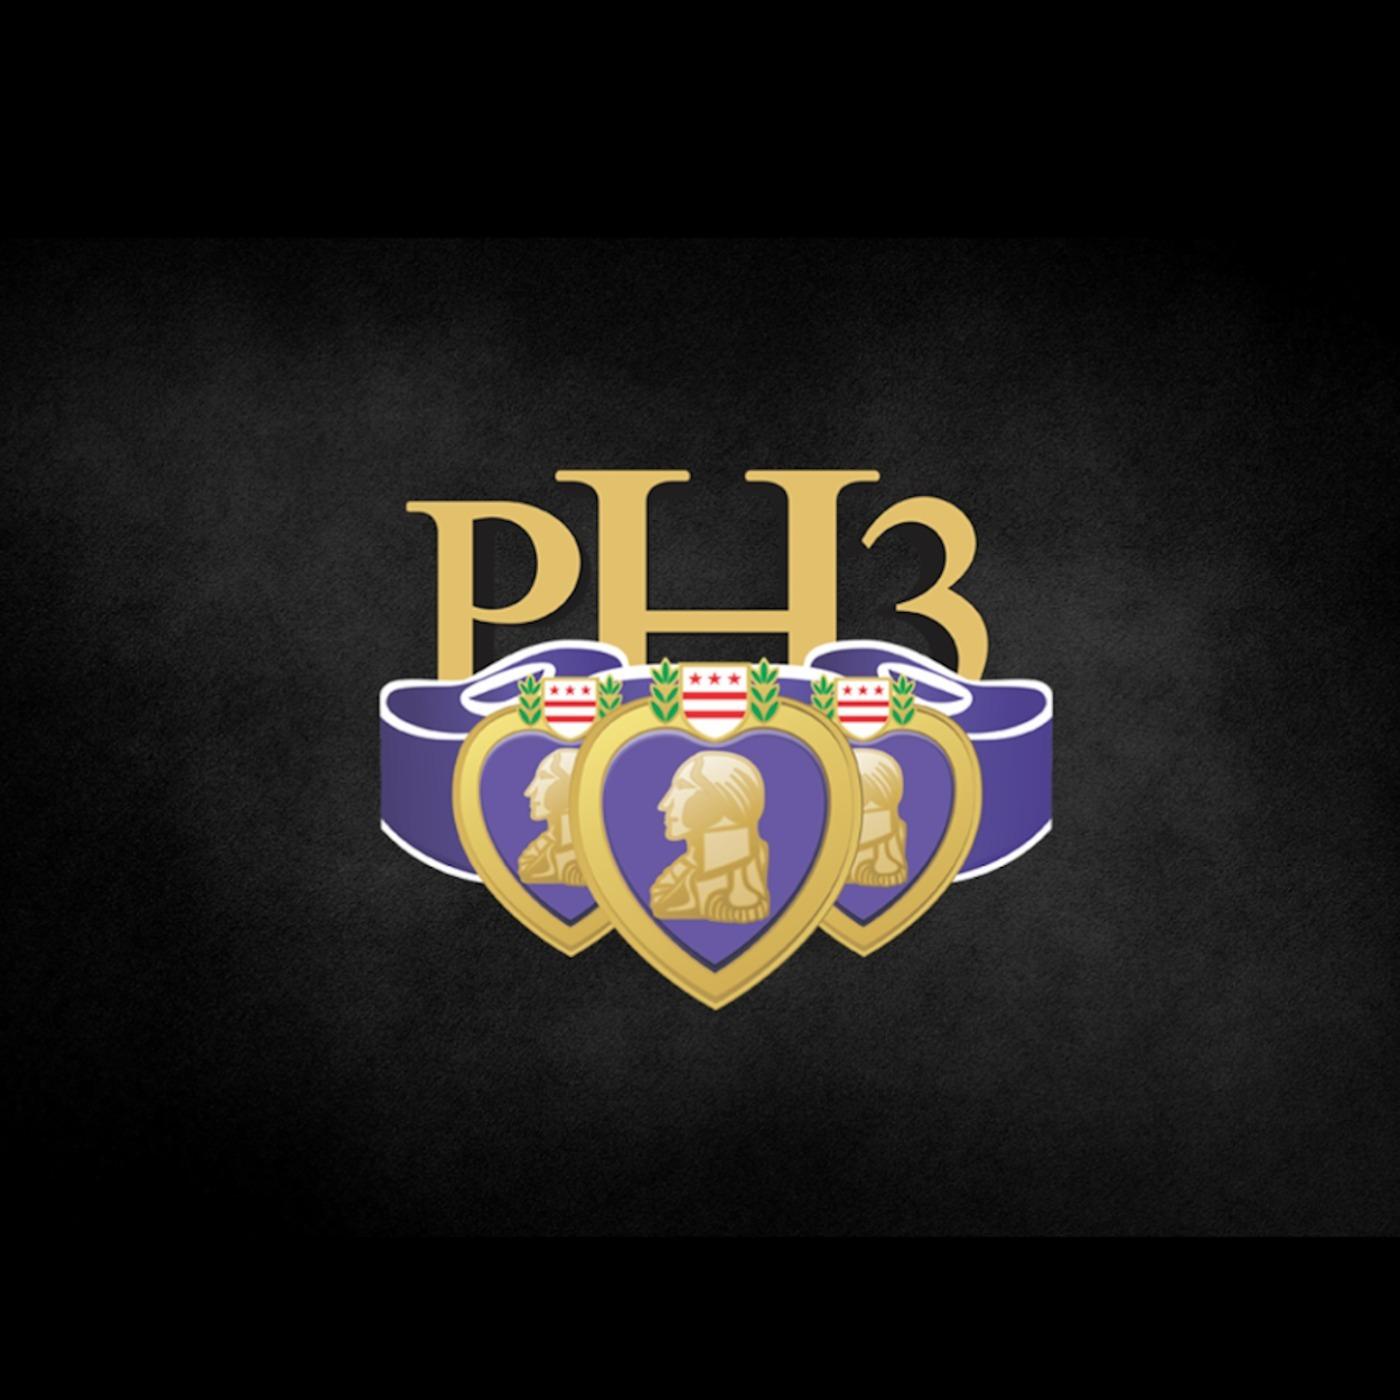 Veteran Cast Episode 15 Purple Heart 3 Ph3 Veteran Owned